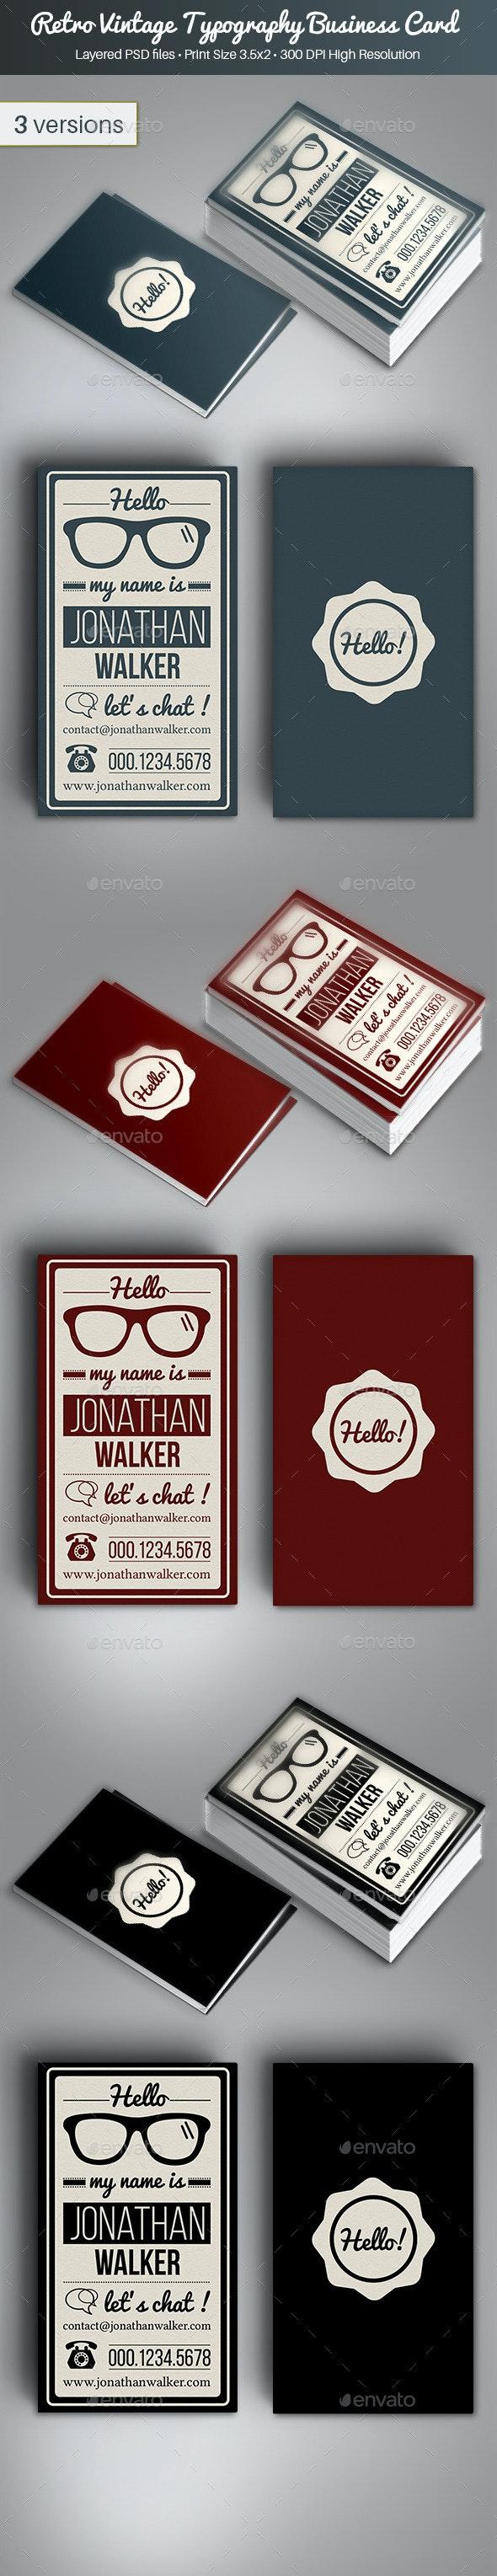 Retro Vintage Typography Business Card - Retro/Vintage Business Cards